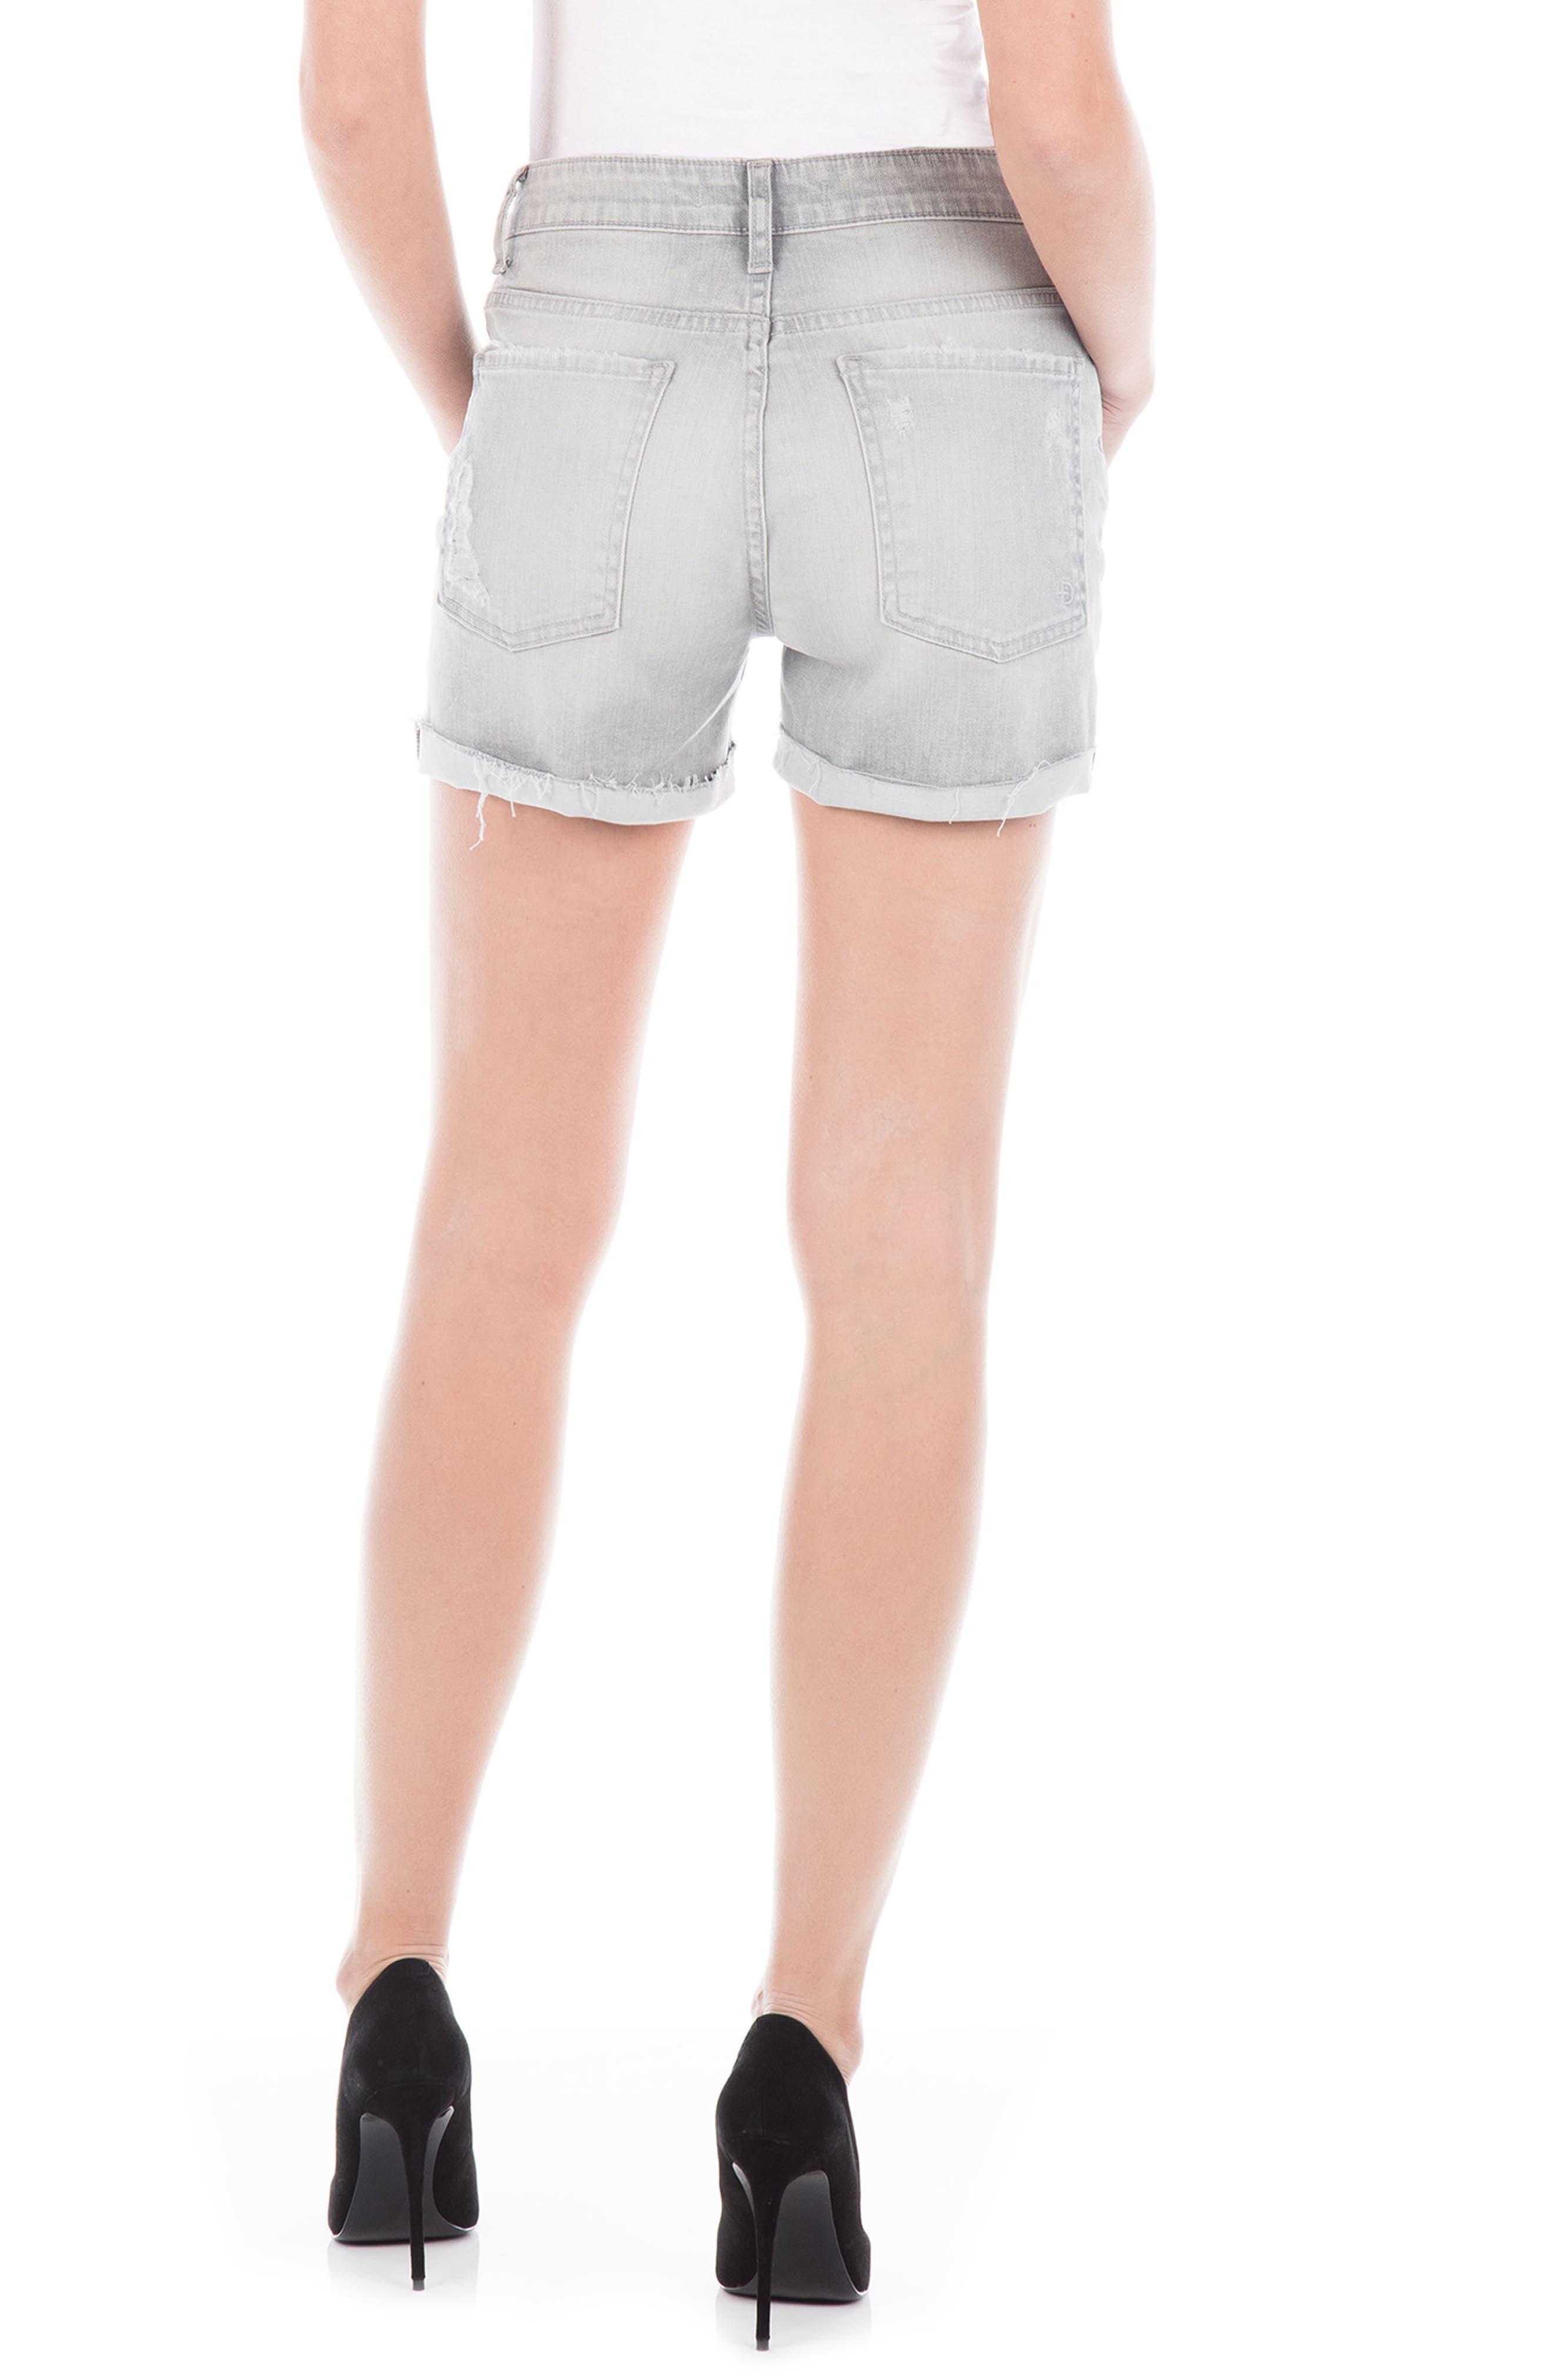 Jonesy High Waist Denim Shorts,                             Alternate thumbnail 2, color,                             Mercury Vintage